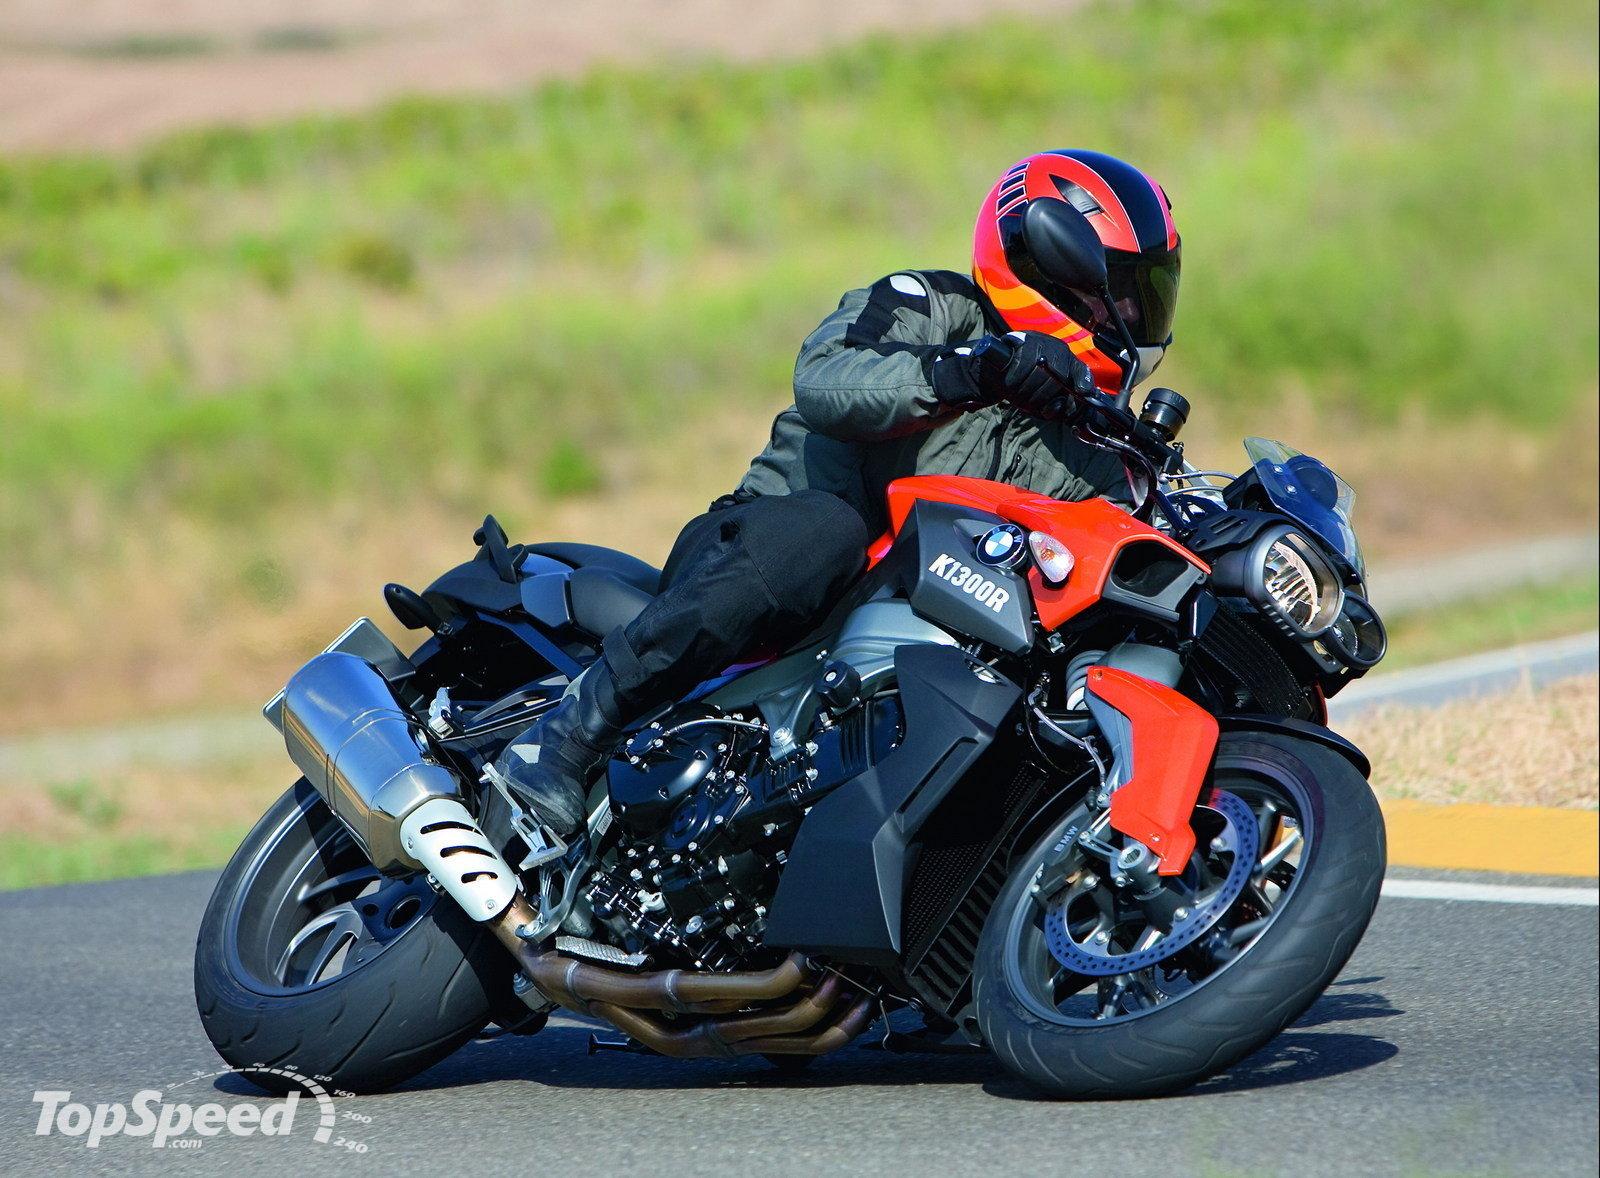 Bmw Heavy Bikes Bmw Bikes Rates In India